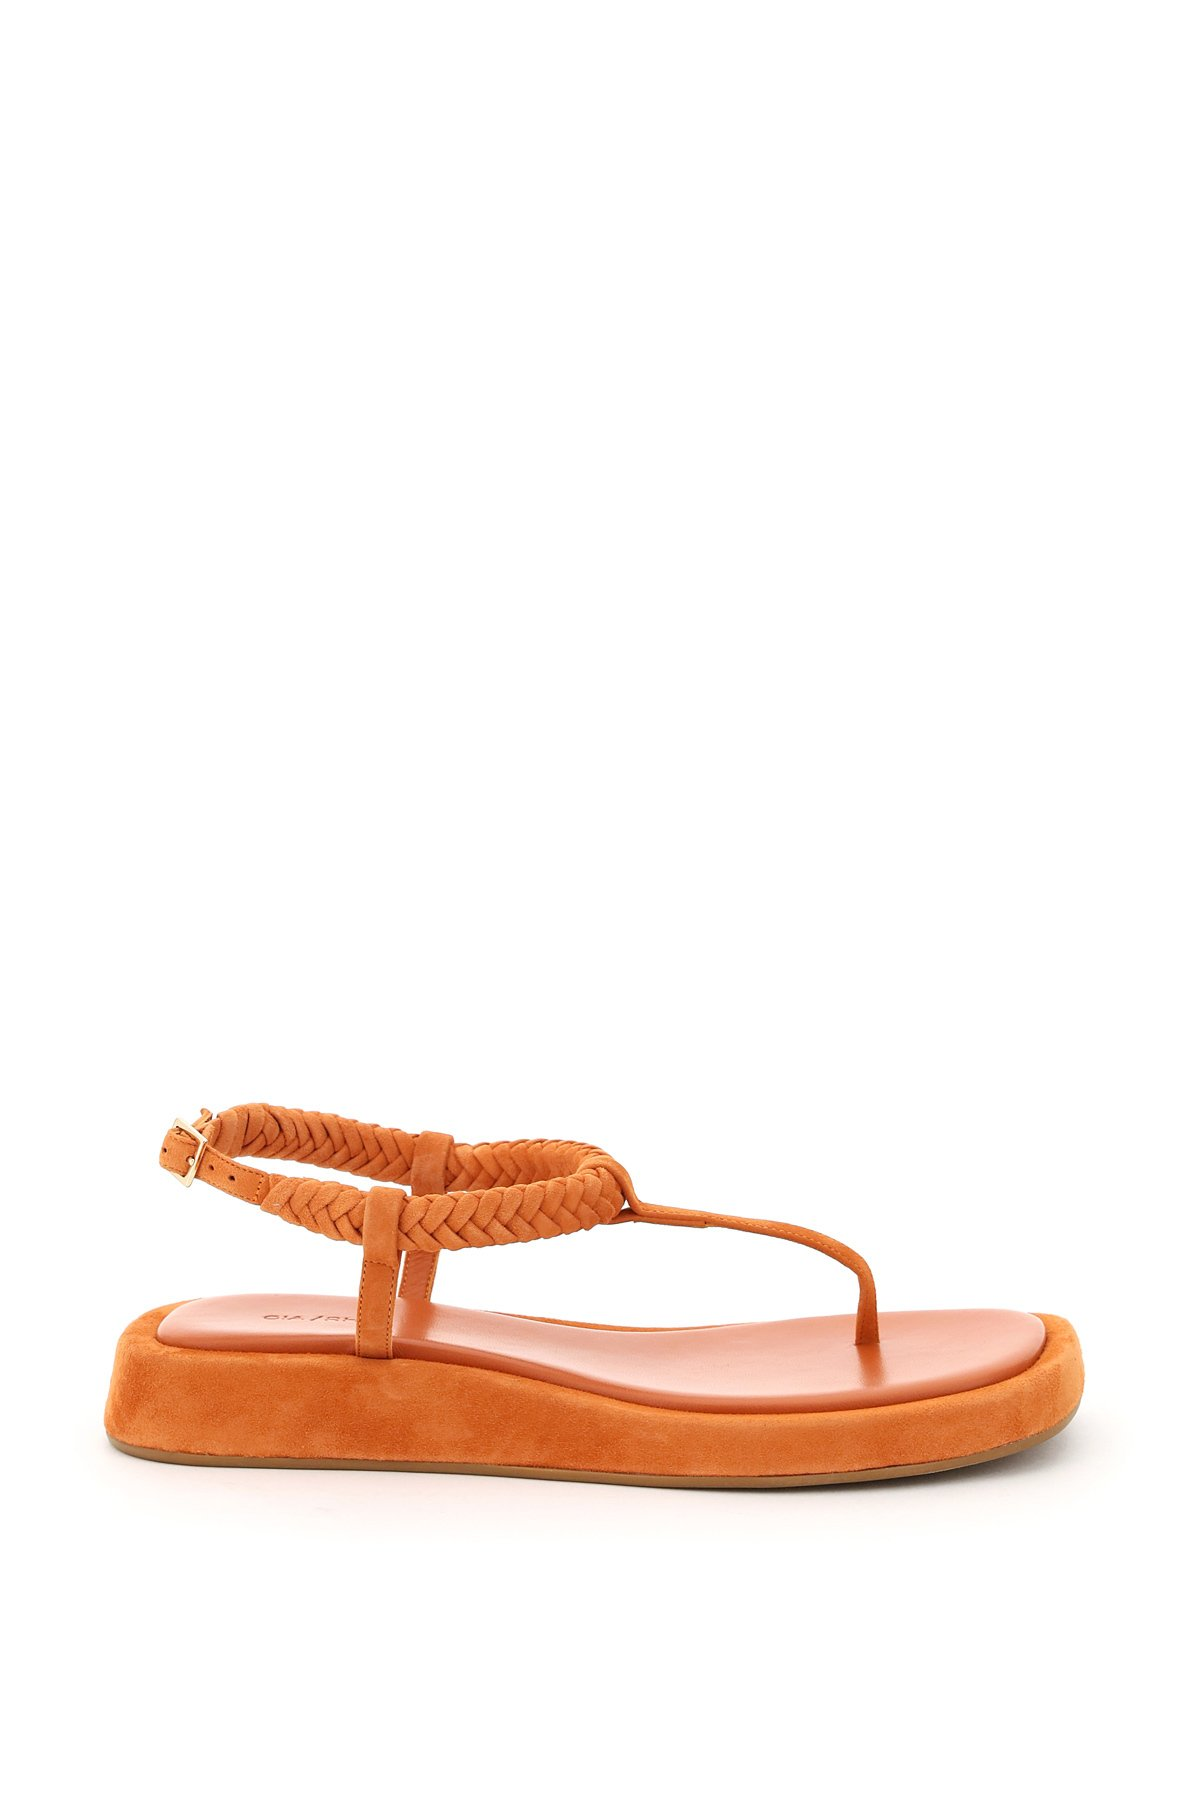 Gia rhw rosie 3 thong sandals